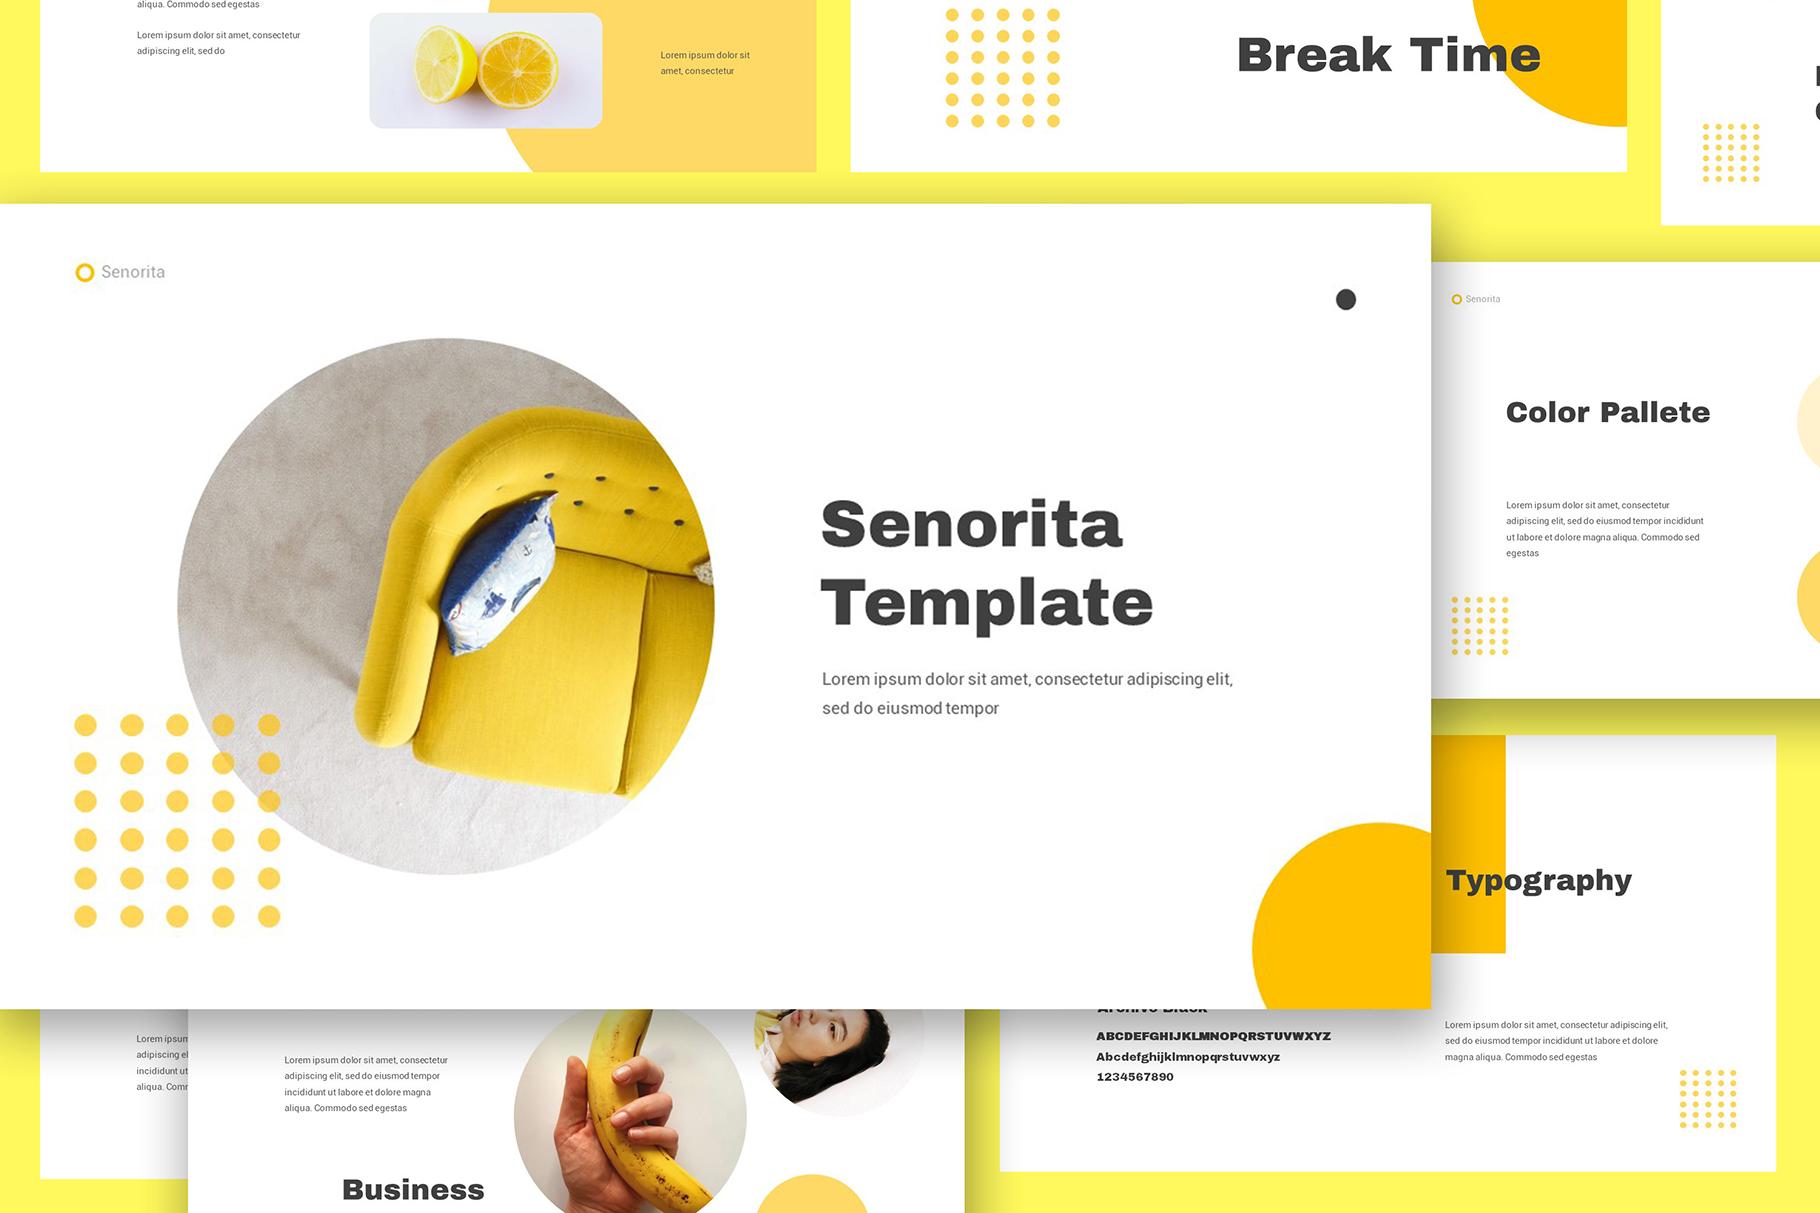 Senorita Brand Guideline Powerpoint example image 4